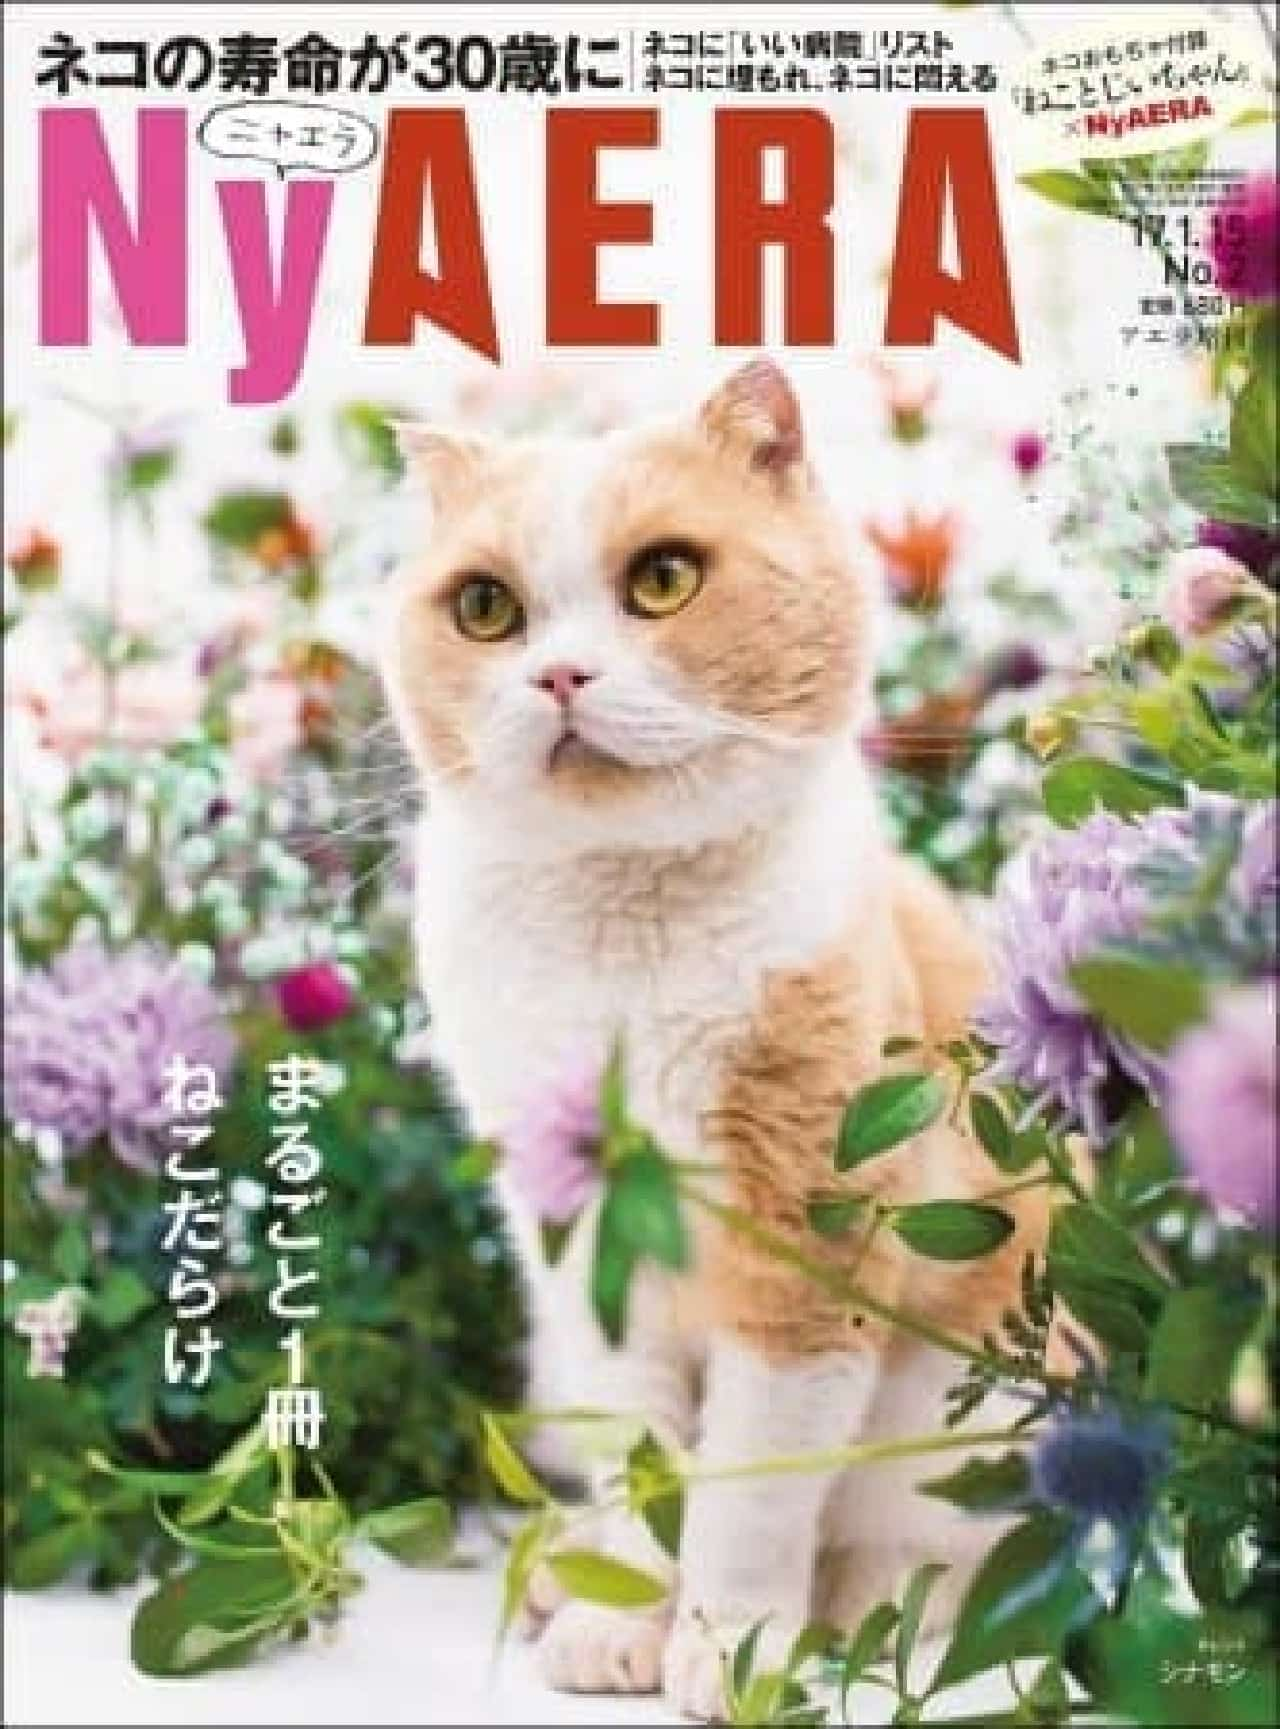 「AERA」がネコまみれ!…編集部総力取材で届ける「NyAERA(ニャエラ)」、大晦日に発売